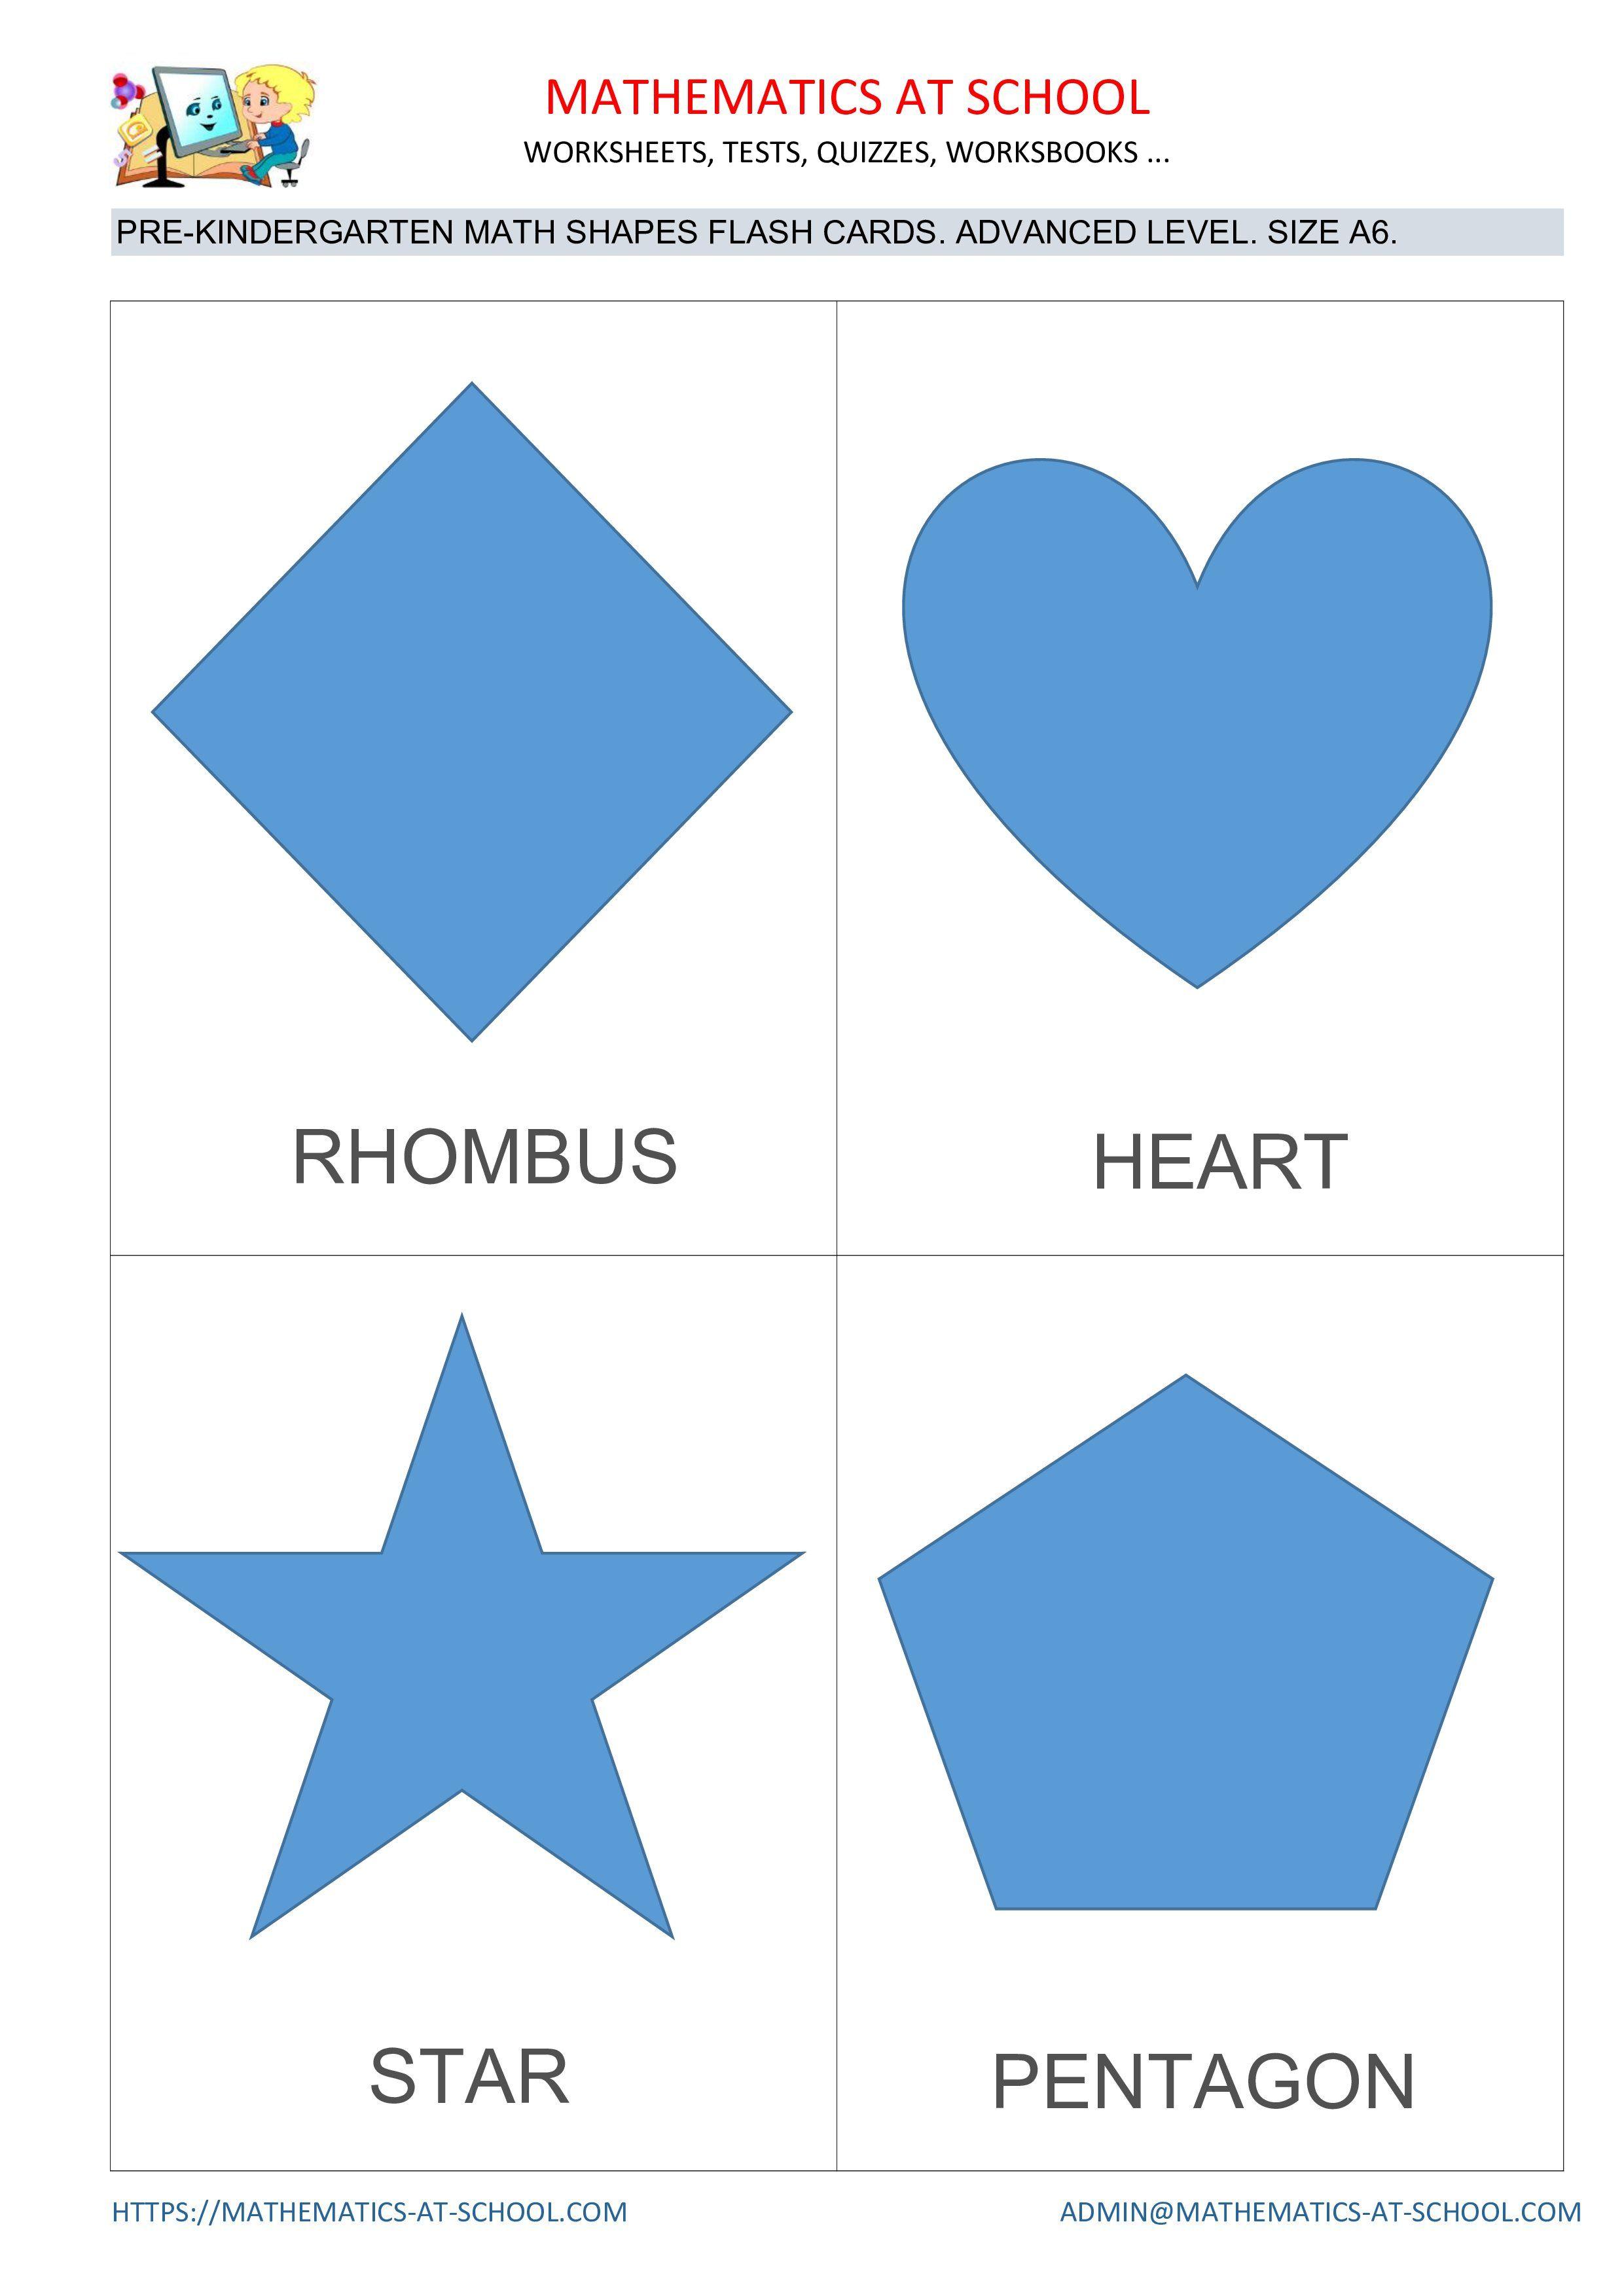 Pre Kindergarten Math Flash Cards Shapes Circle Square